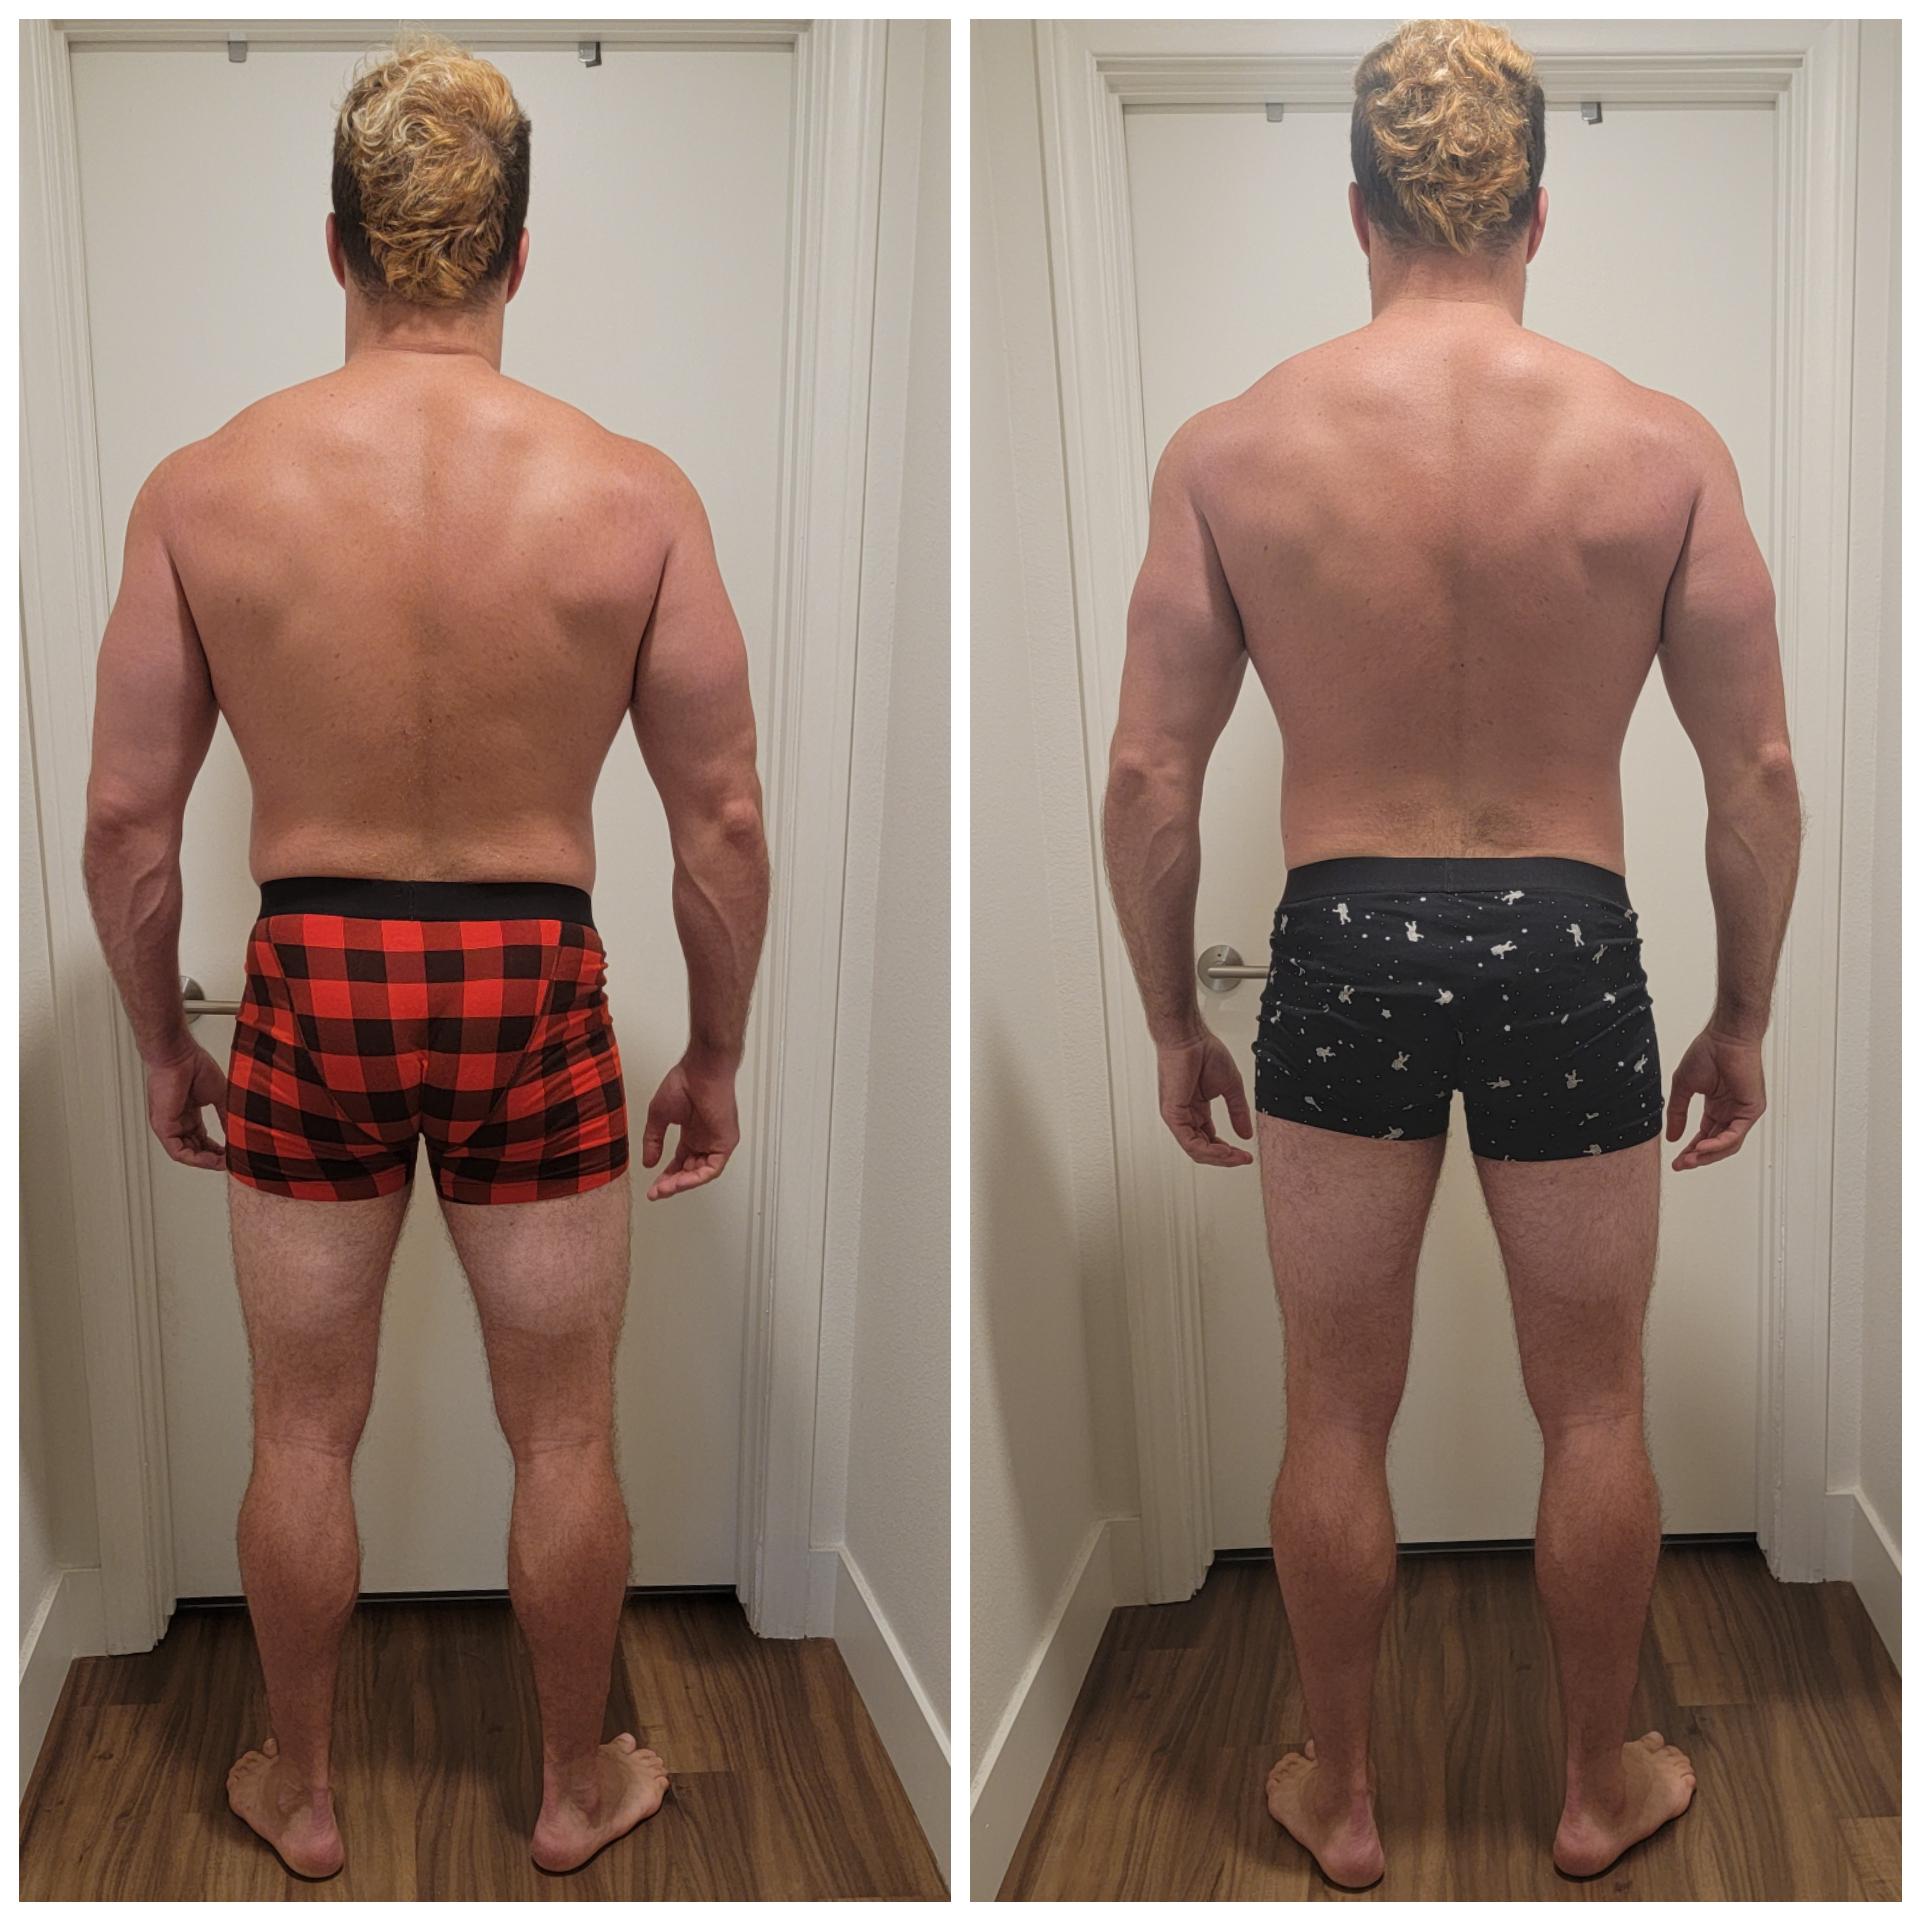 Progress Pics of 10 lbs Weight Loss 6'2 Male 240 lbs to 230 lbs